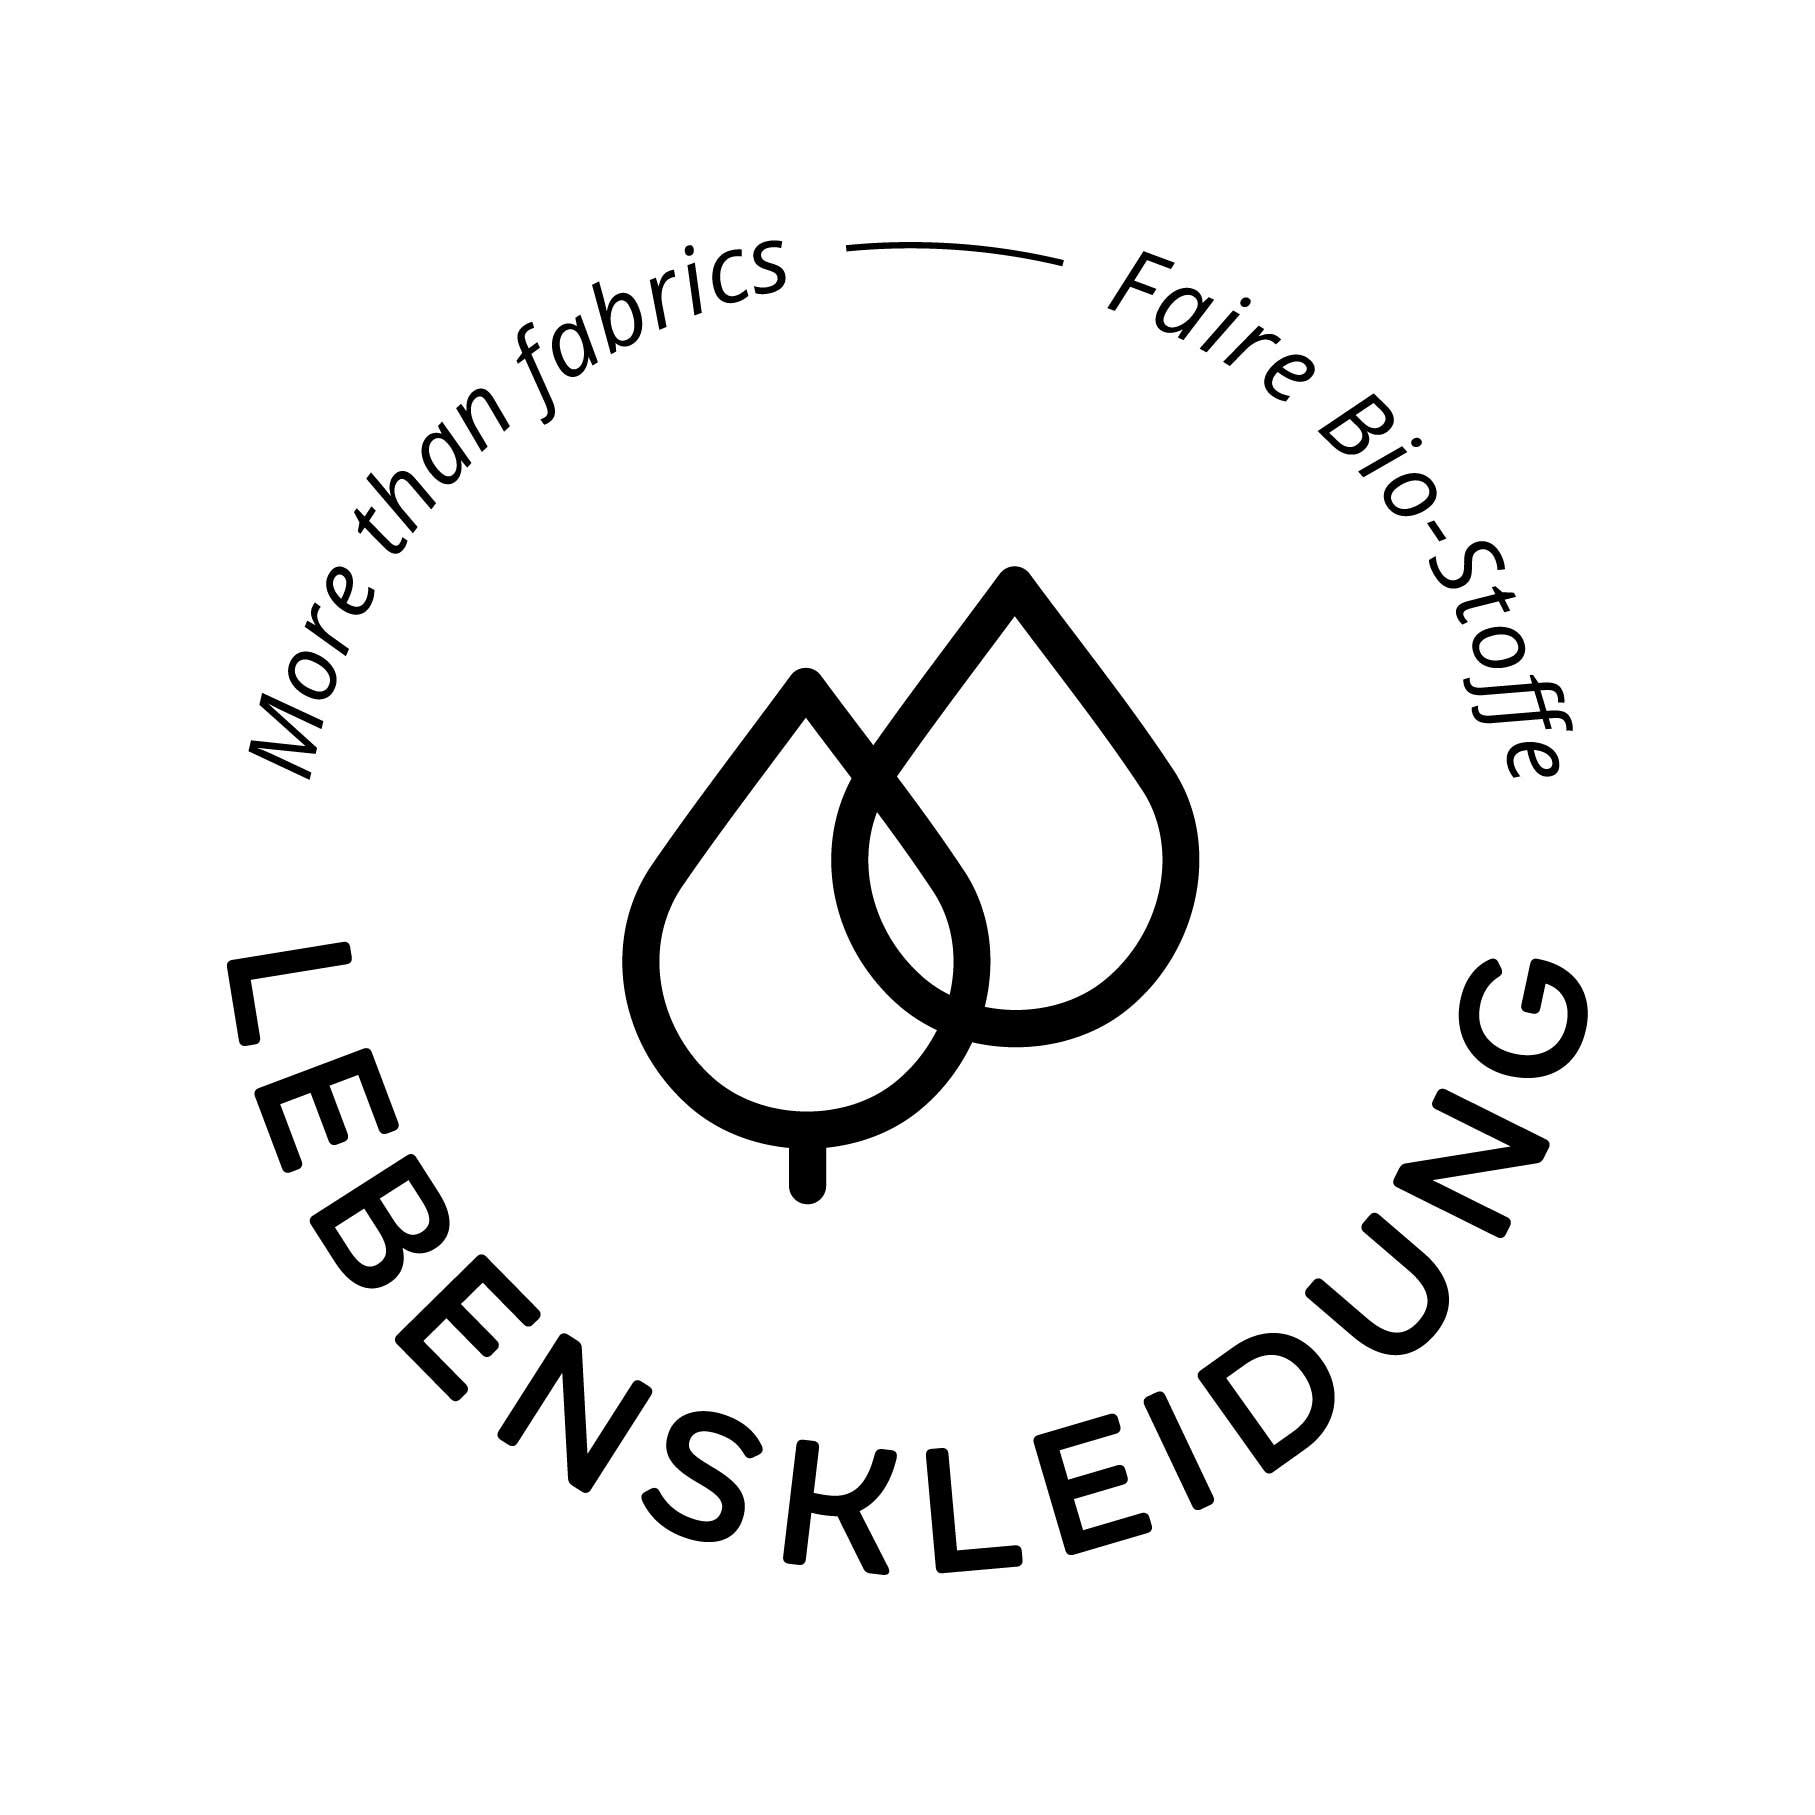 Tessuti organici Cordone di gomma - 40% cotone organico 60% gomma naturale -  adatto per tessuti leggeri e di peso medio - 2,2mm diámetro -  Ecru  - 100 Metros-1